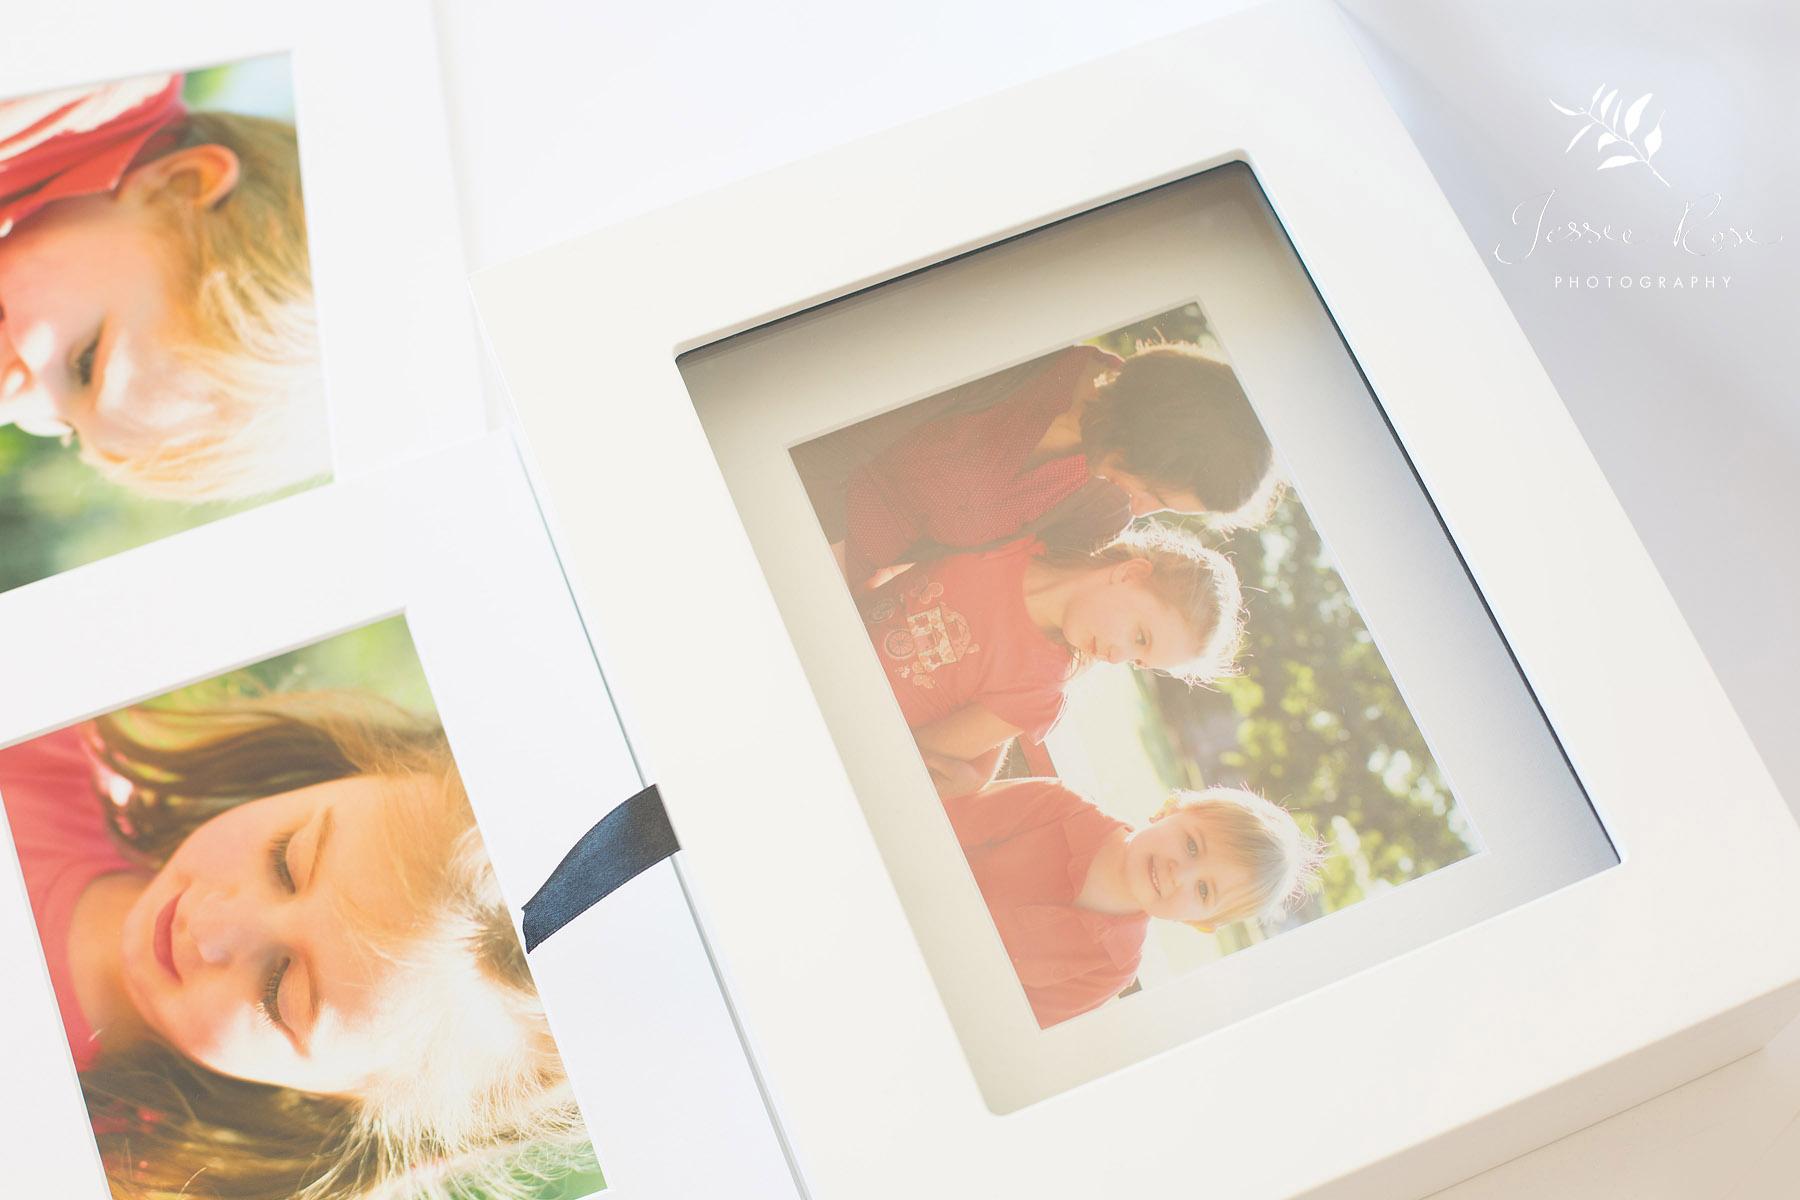 matted-prints-display-box